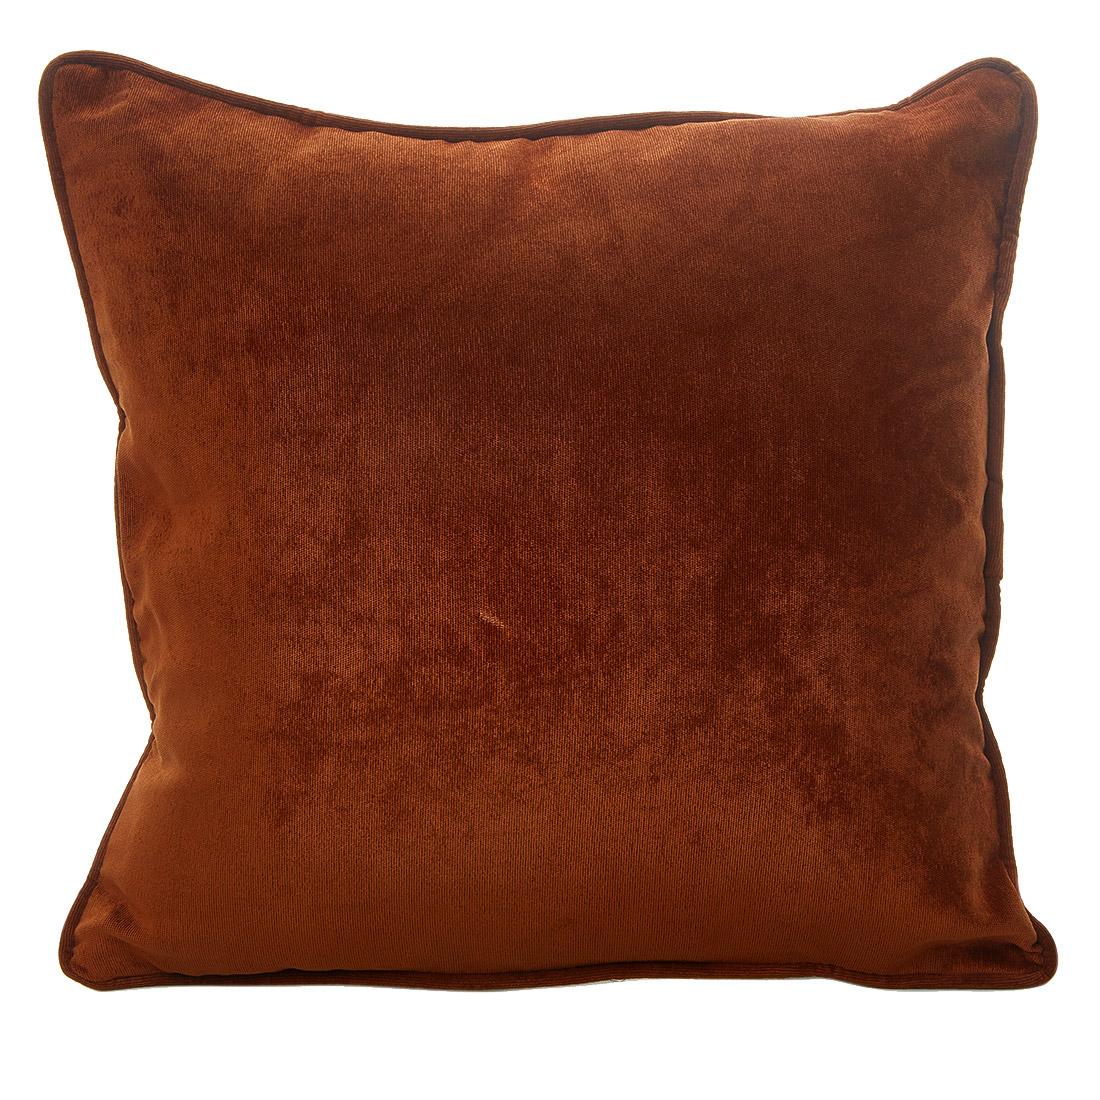 Rib Velour Russet Cushion